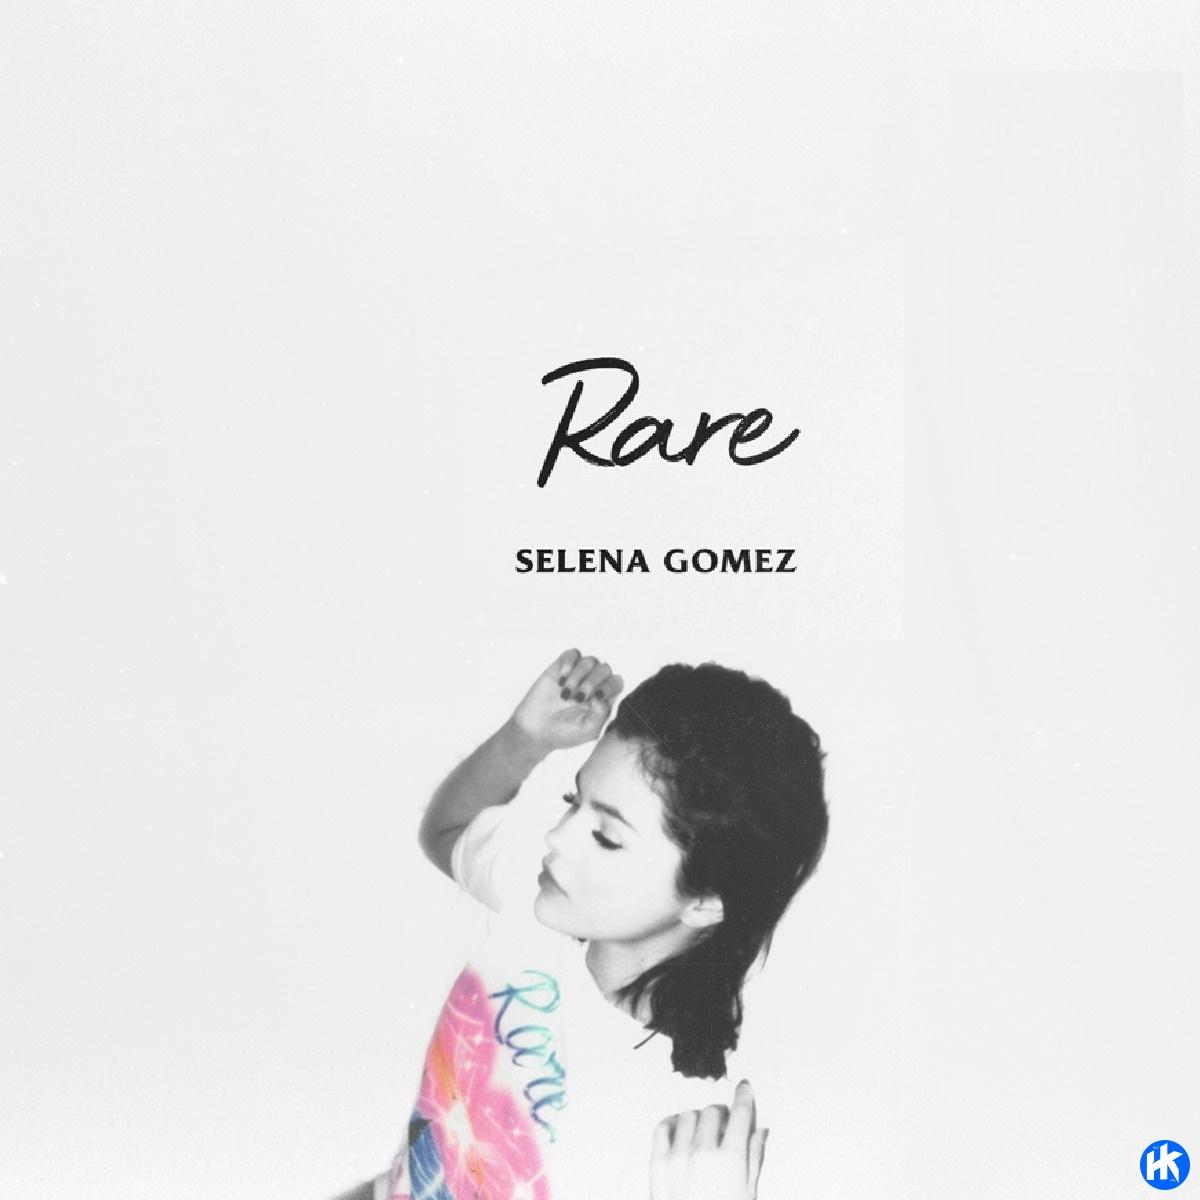 Selena Gomez – People You Know